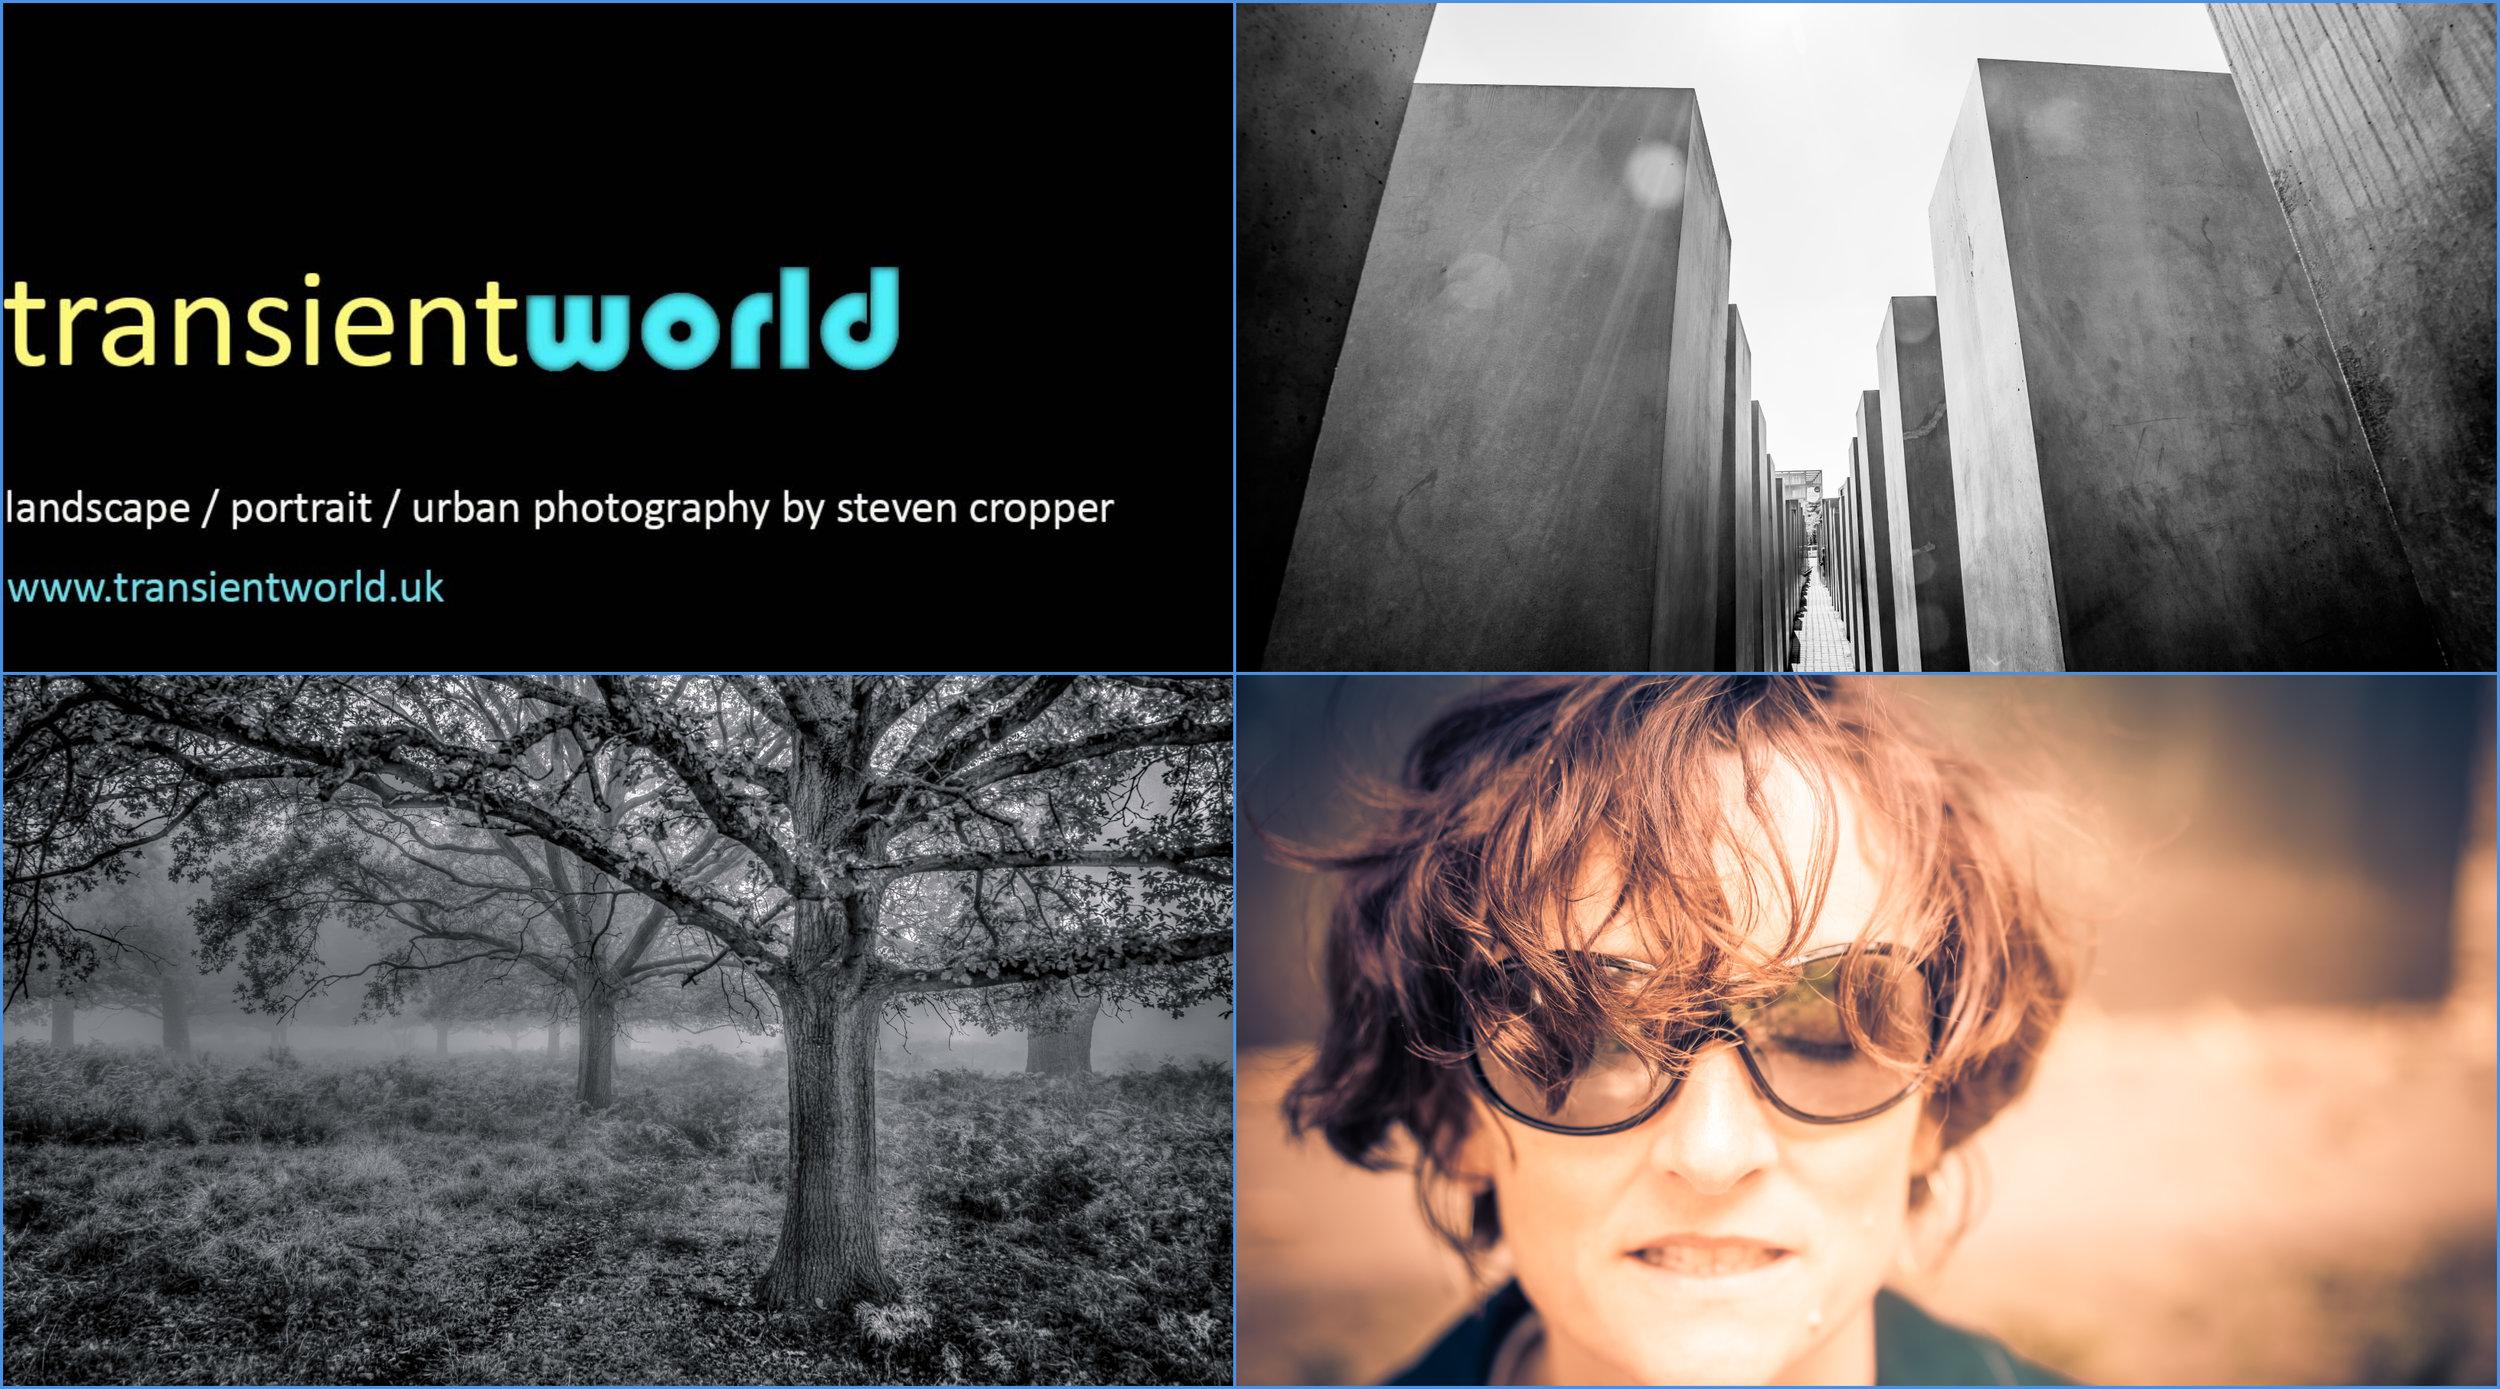 transientworld flyer (2).jpg